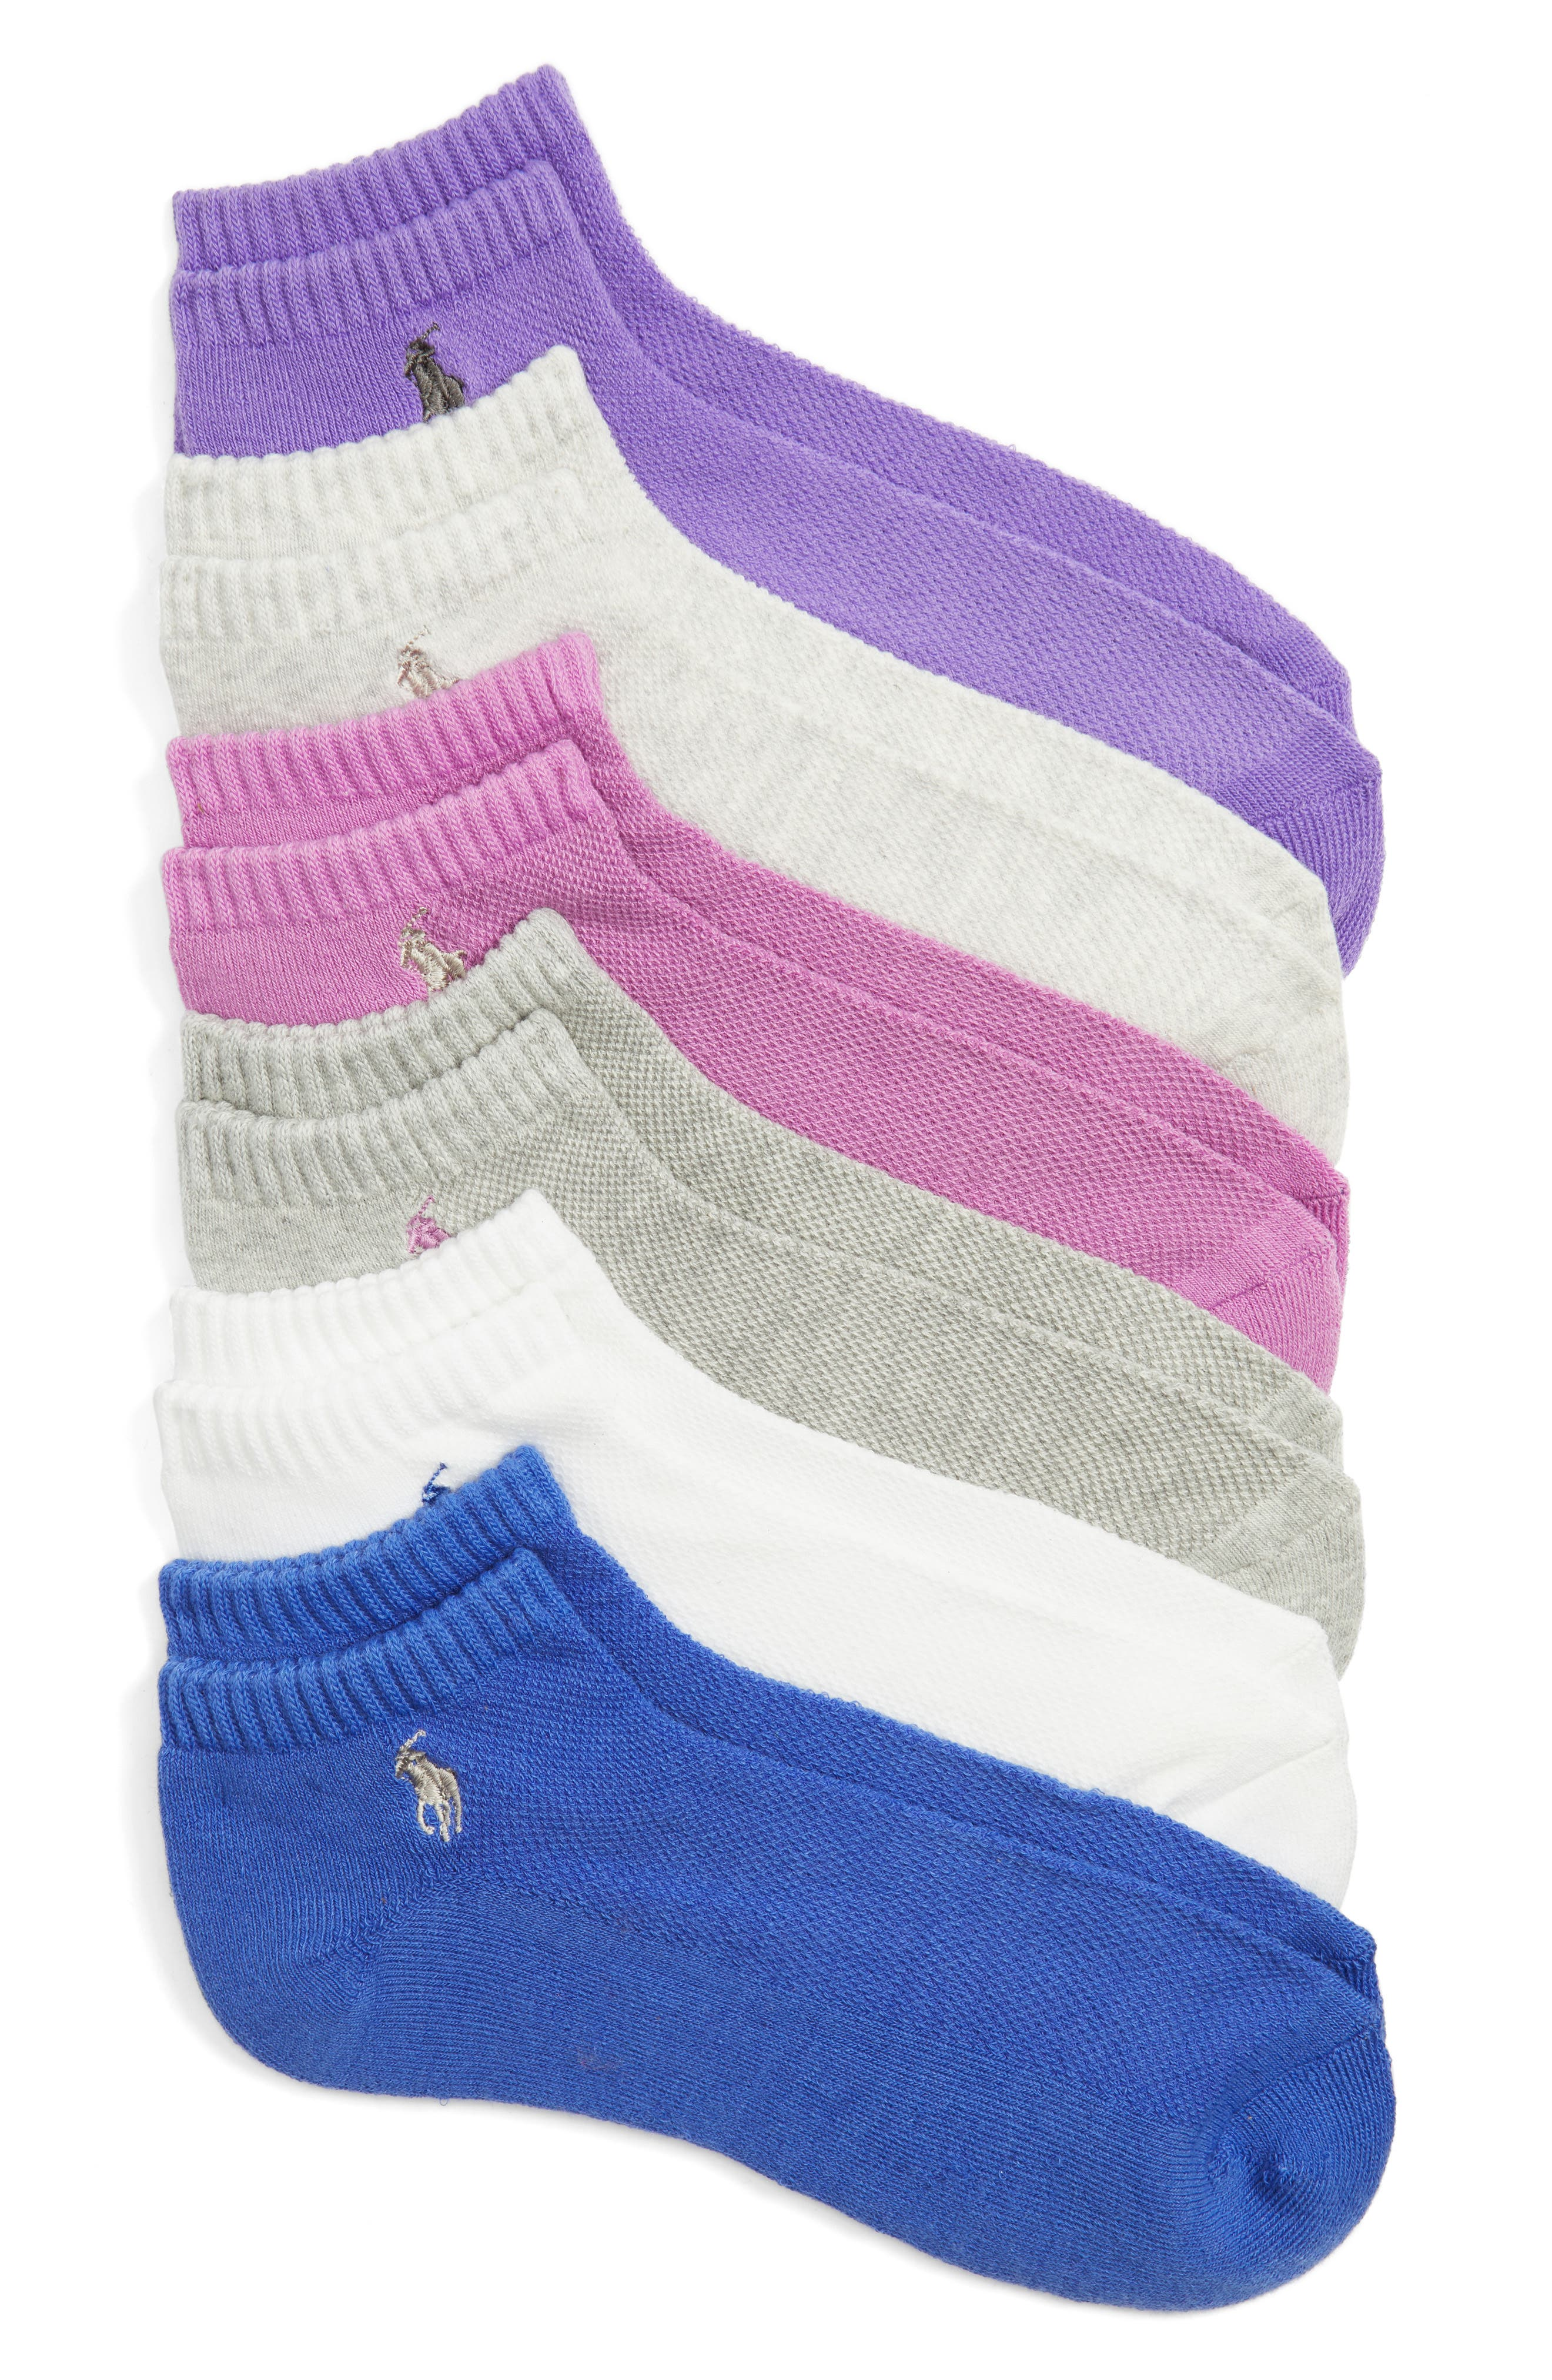 Sport 6-Pack Low-Cut Socks,                             Main thumbnail 1, color,